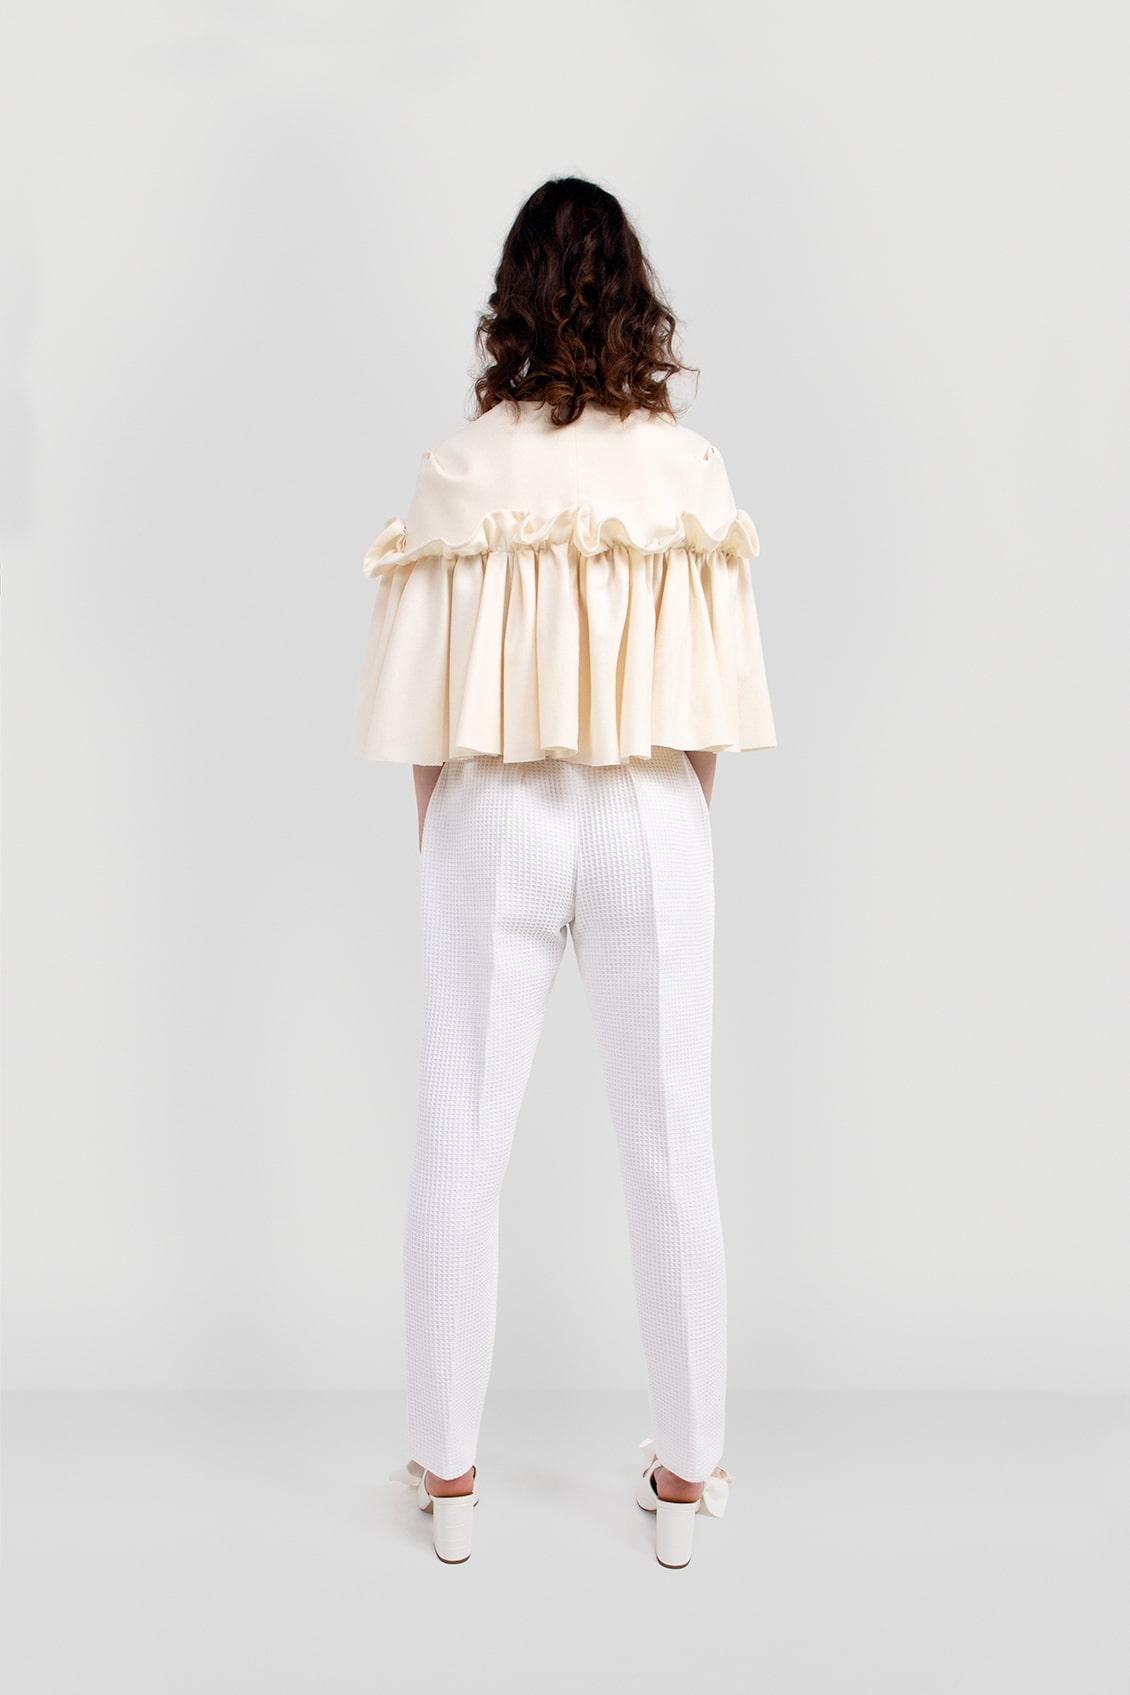 VALDONE Au - Back of the cream colour British wool designer cape HAZEL